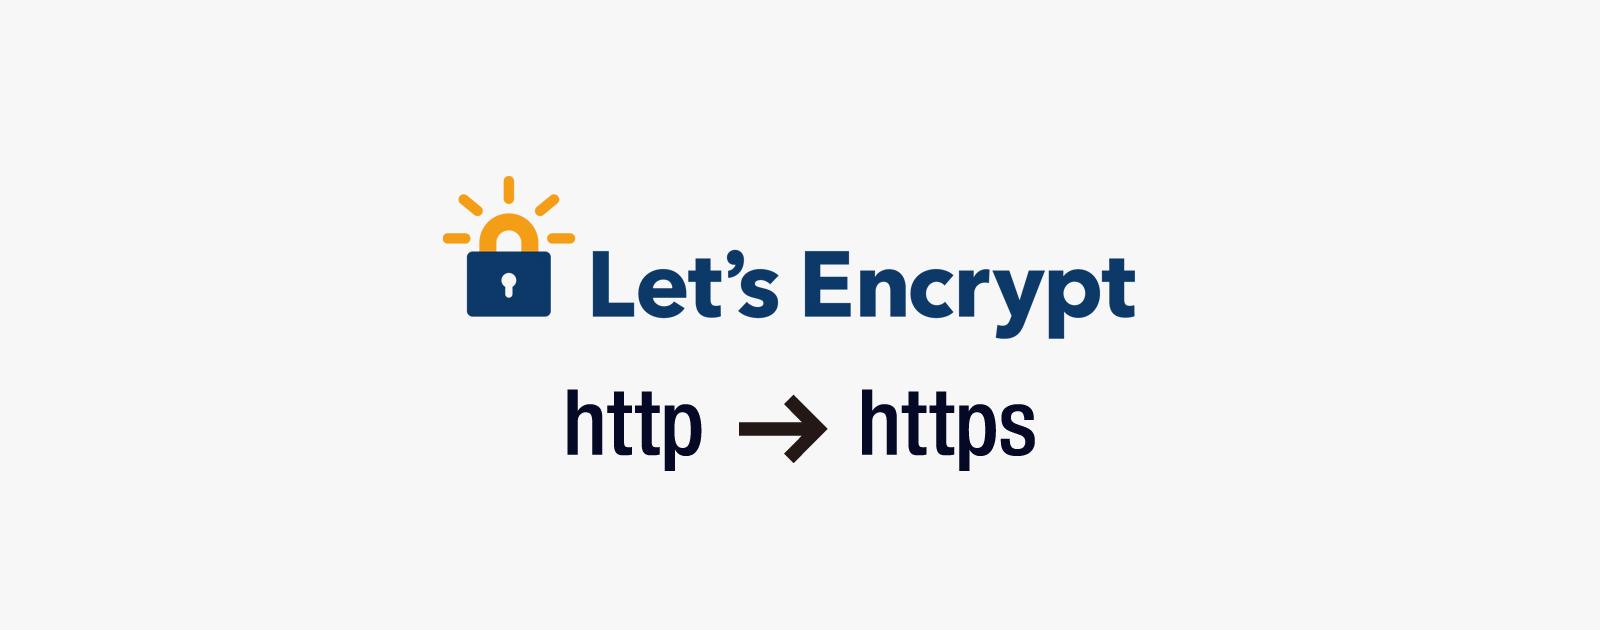 WordPressのサイトをHTTPS化して学ぶLet's Encryptの使い方